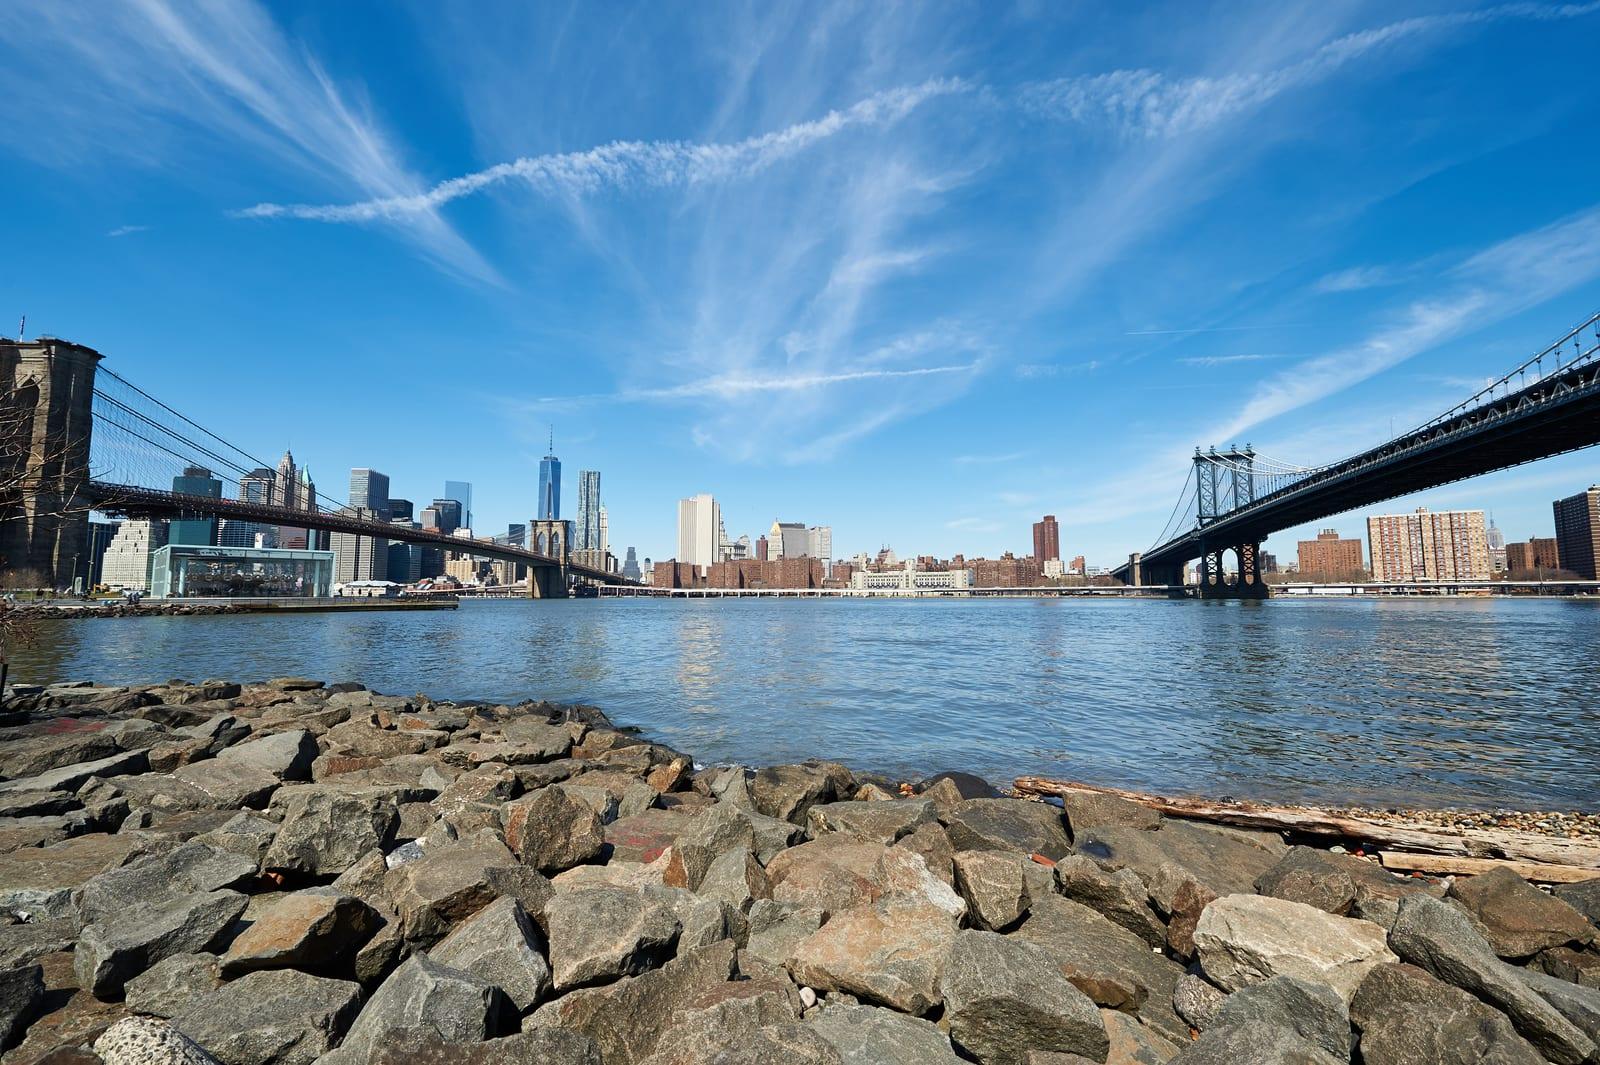 Stuyvesant Square Manhattan, NY Private Investigator